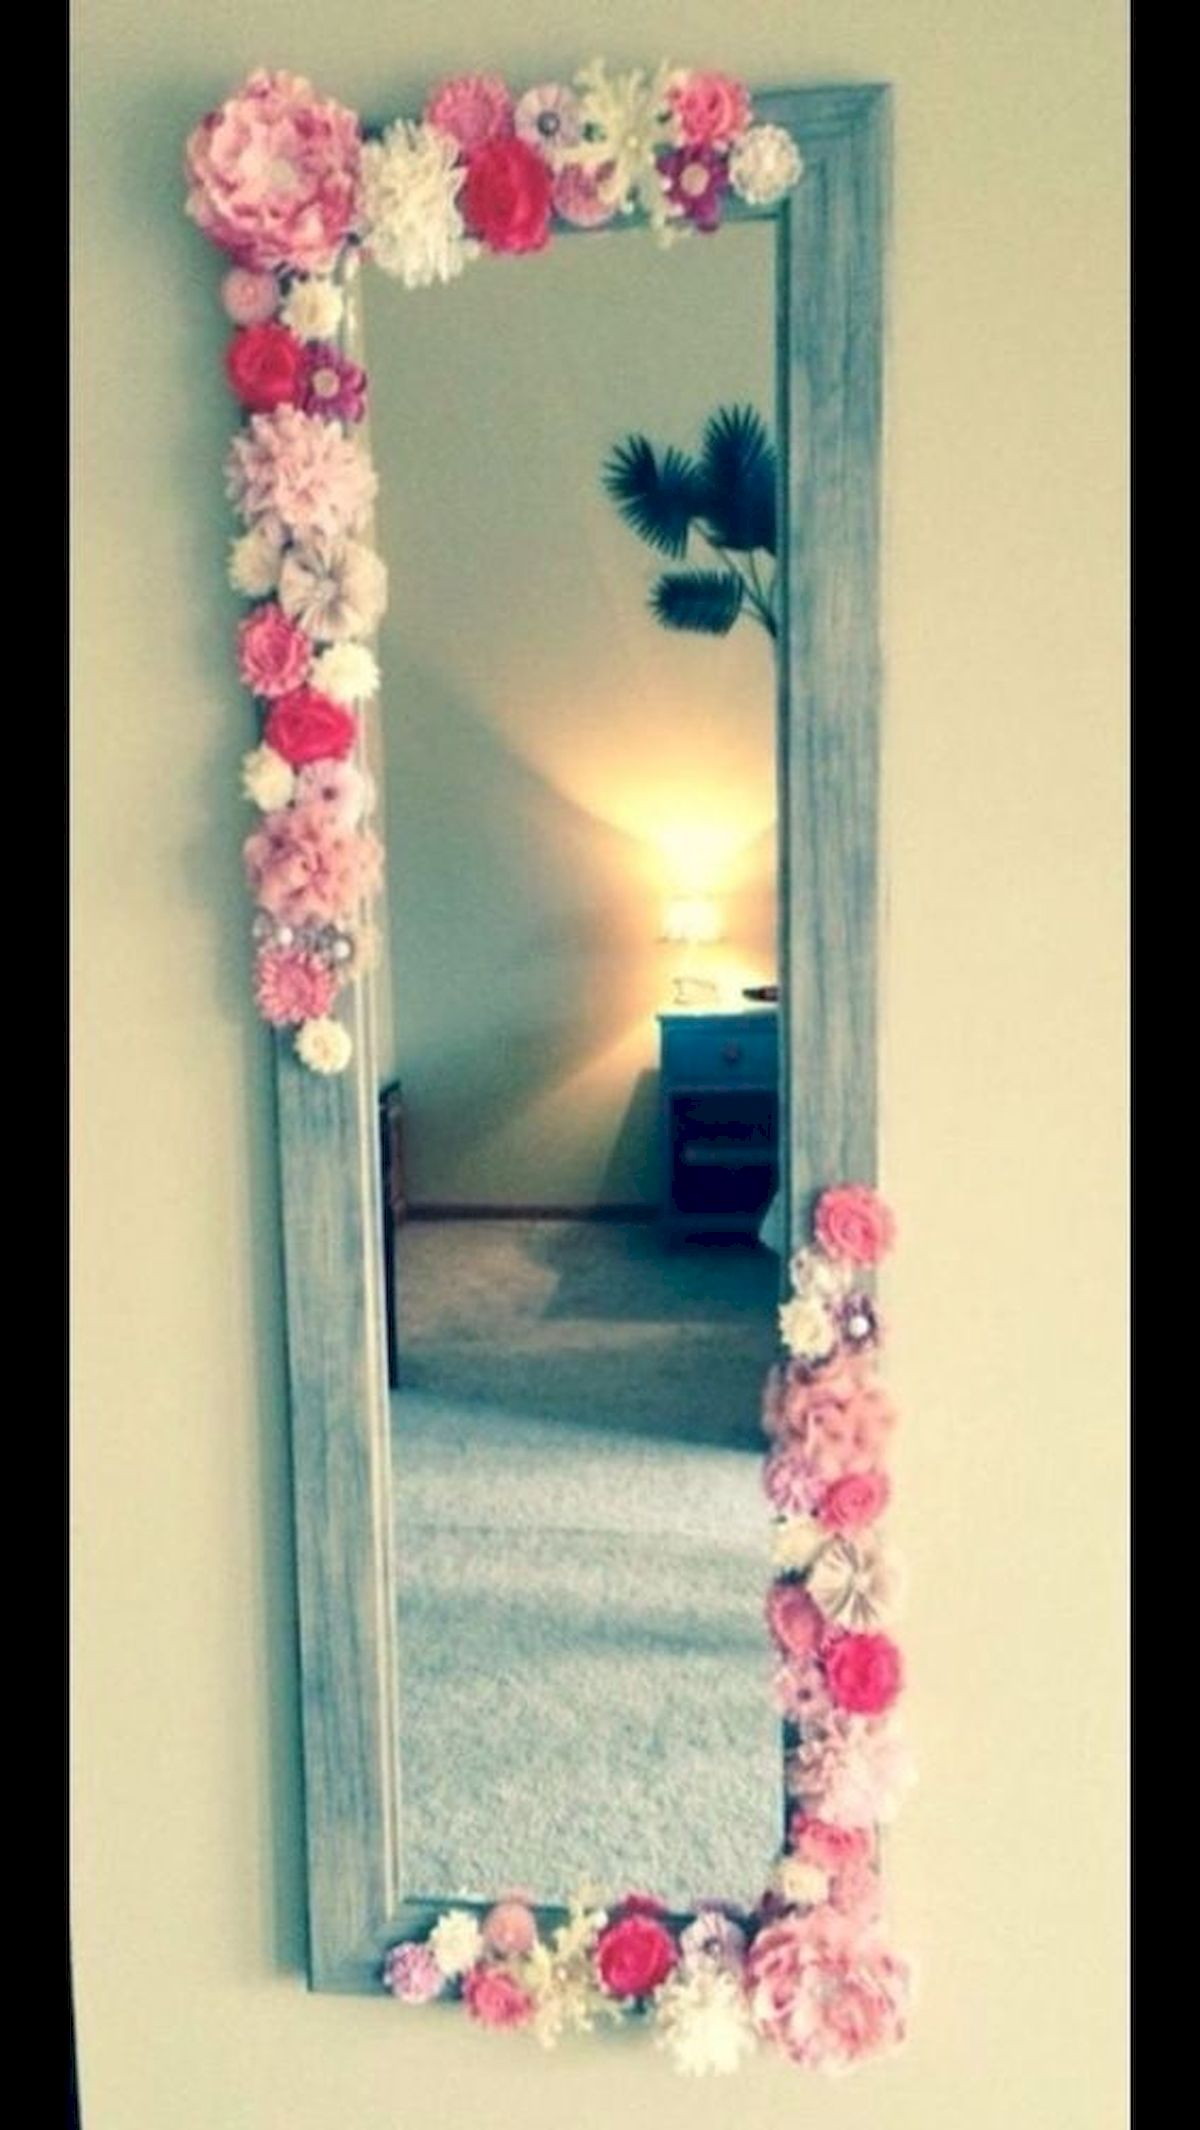 45 Beautiful Bedroom Decor Ideas for Teens (25)